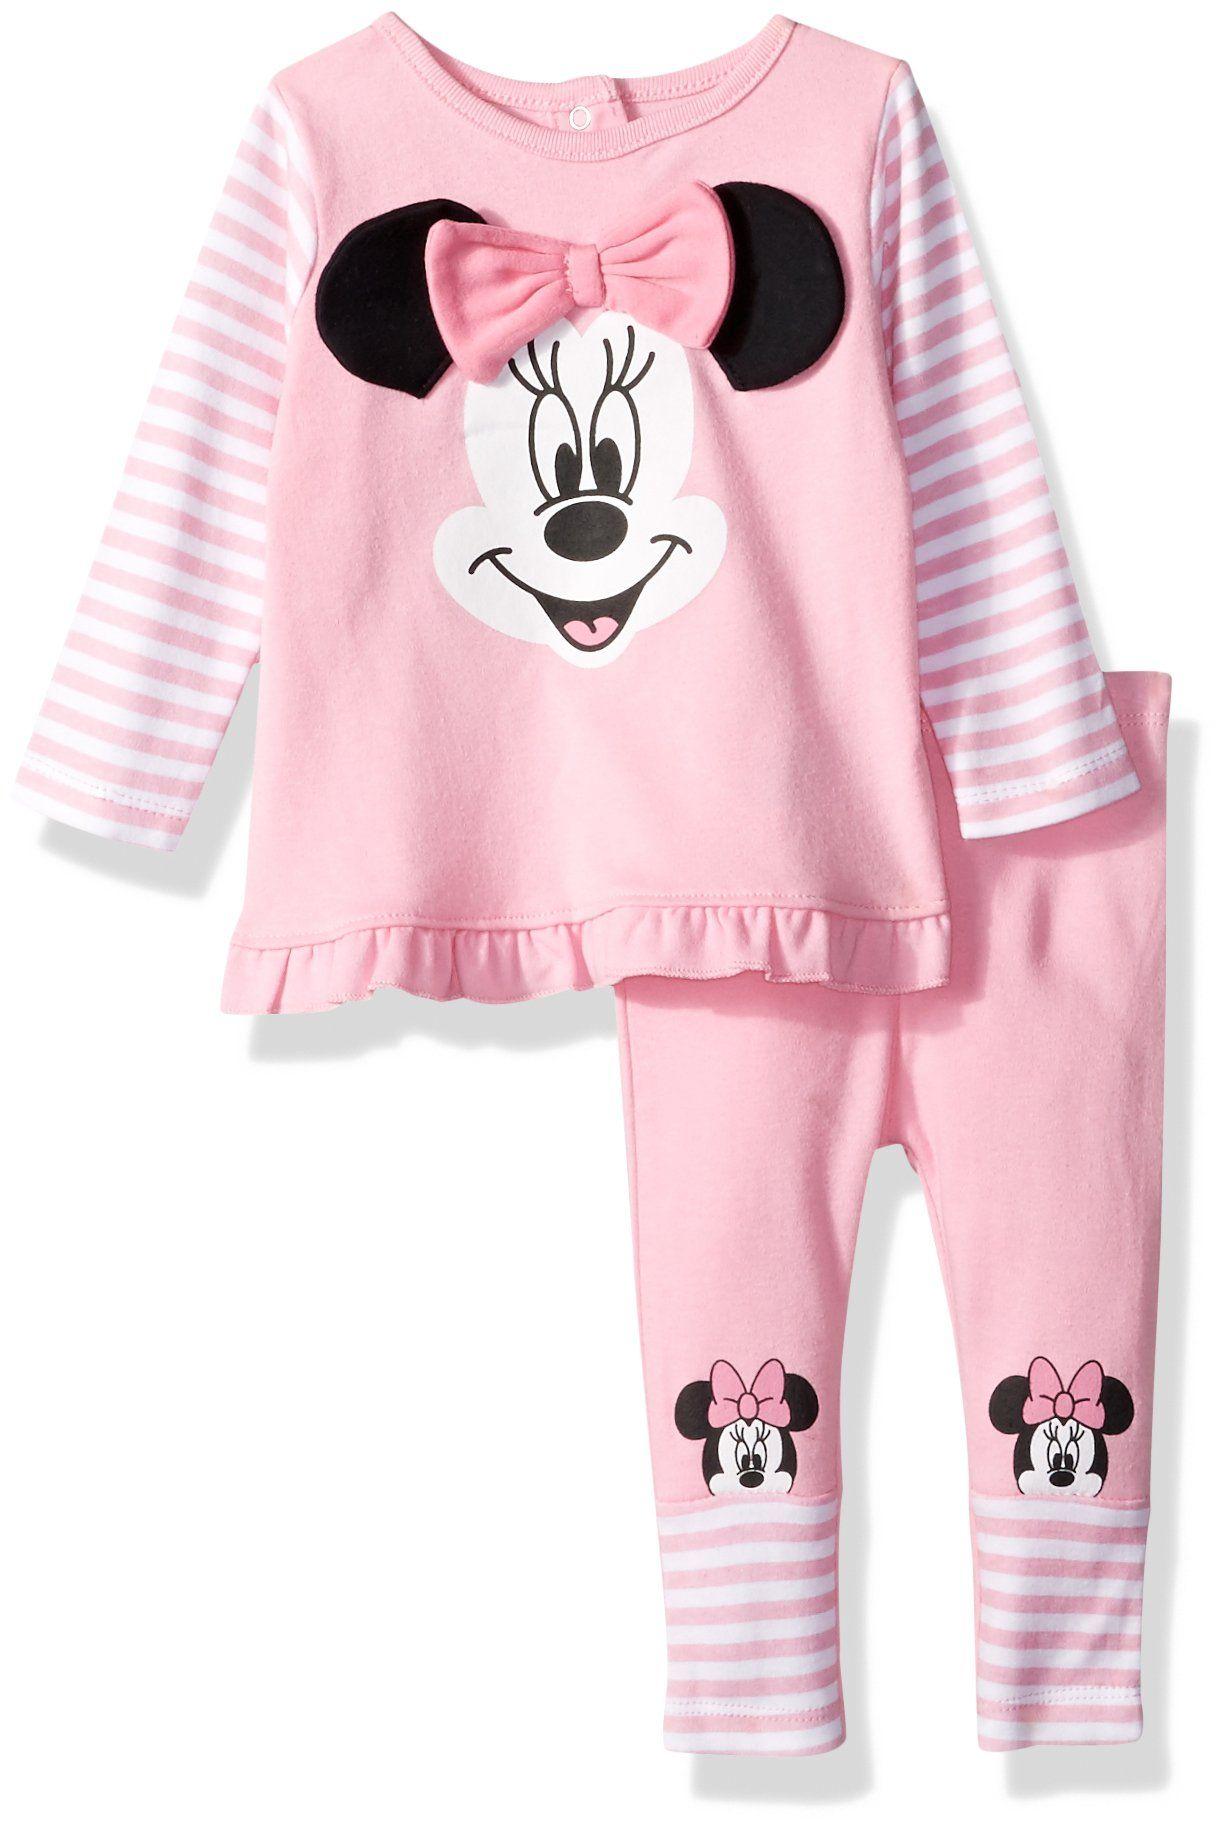 59c9145ea9ac Disney Baby Girls Minnie Mouse 2 Piece Top Big Face Set Pink 03 ...